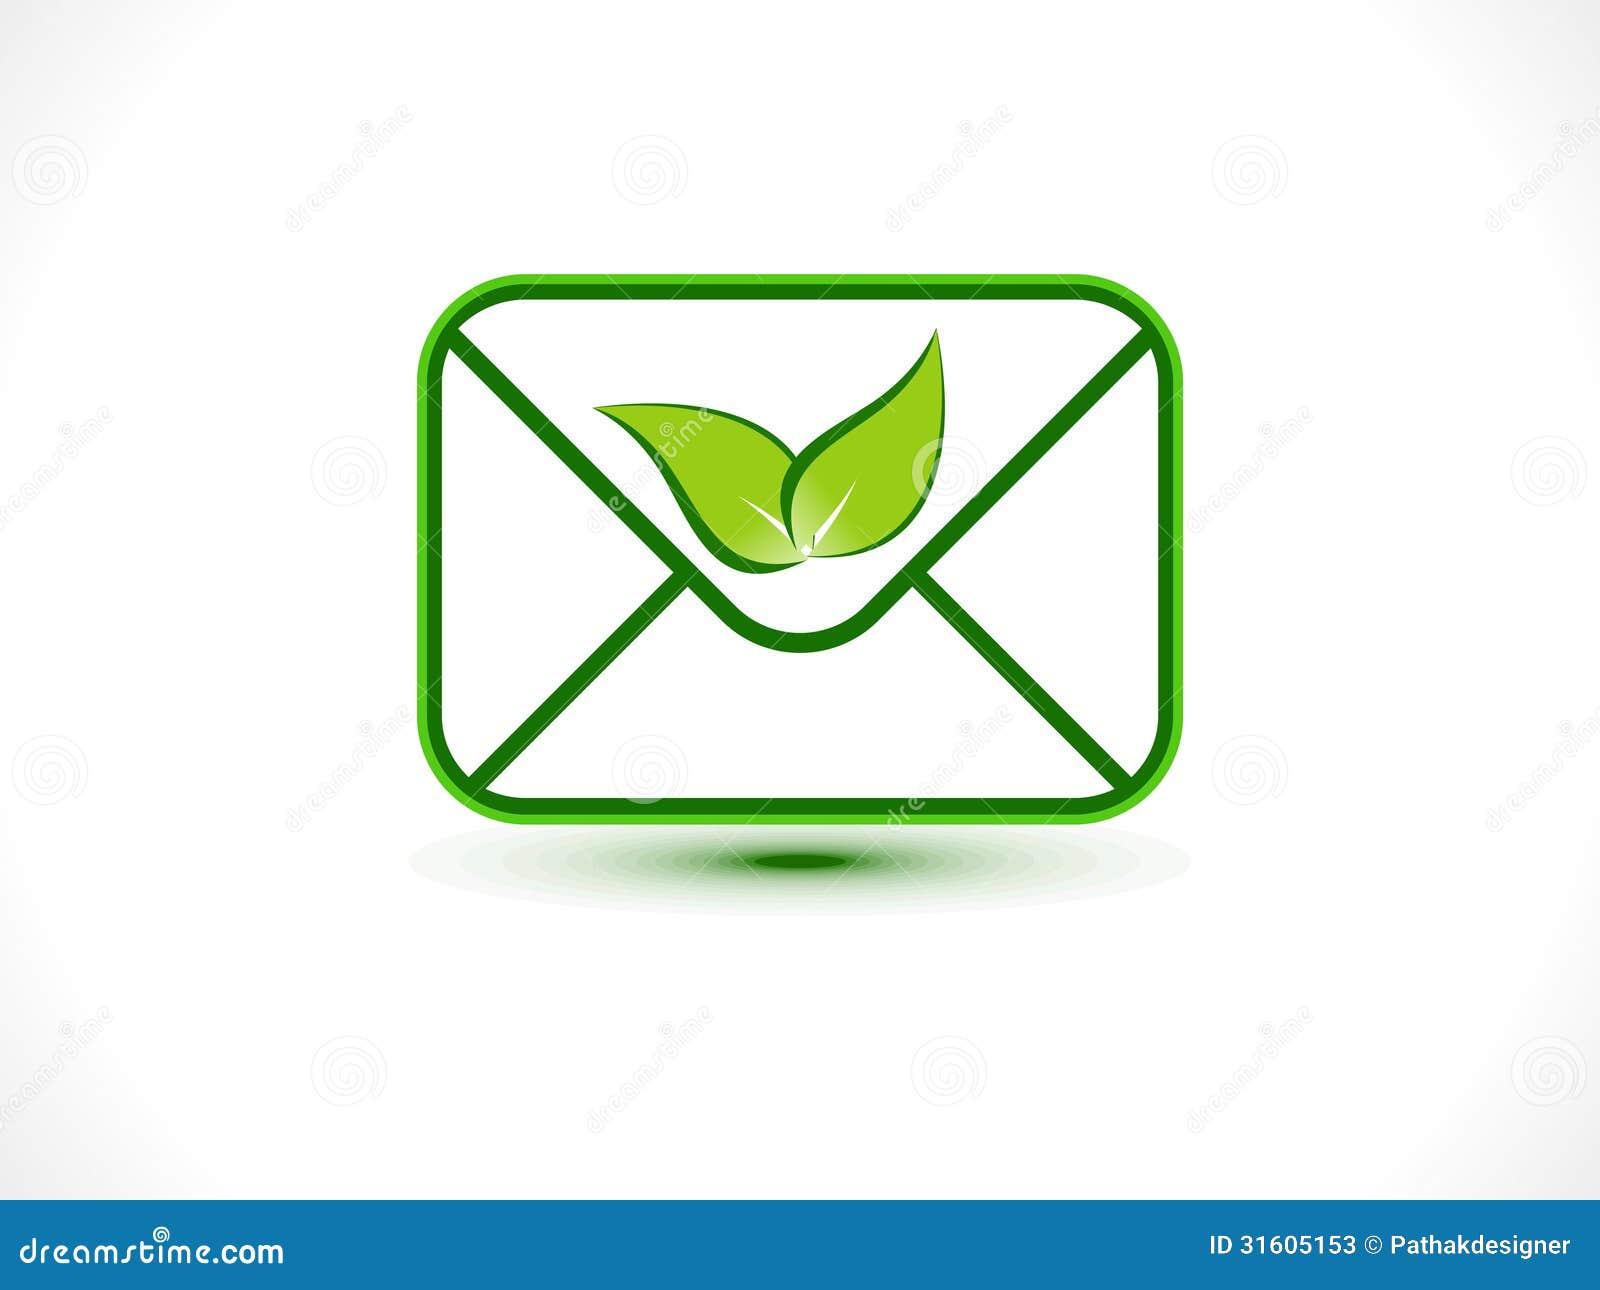 Скачать Eco Technology Flat Icons: Abstract Eco Mail Icon Stock Photos